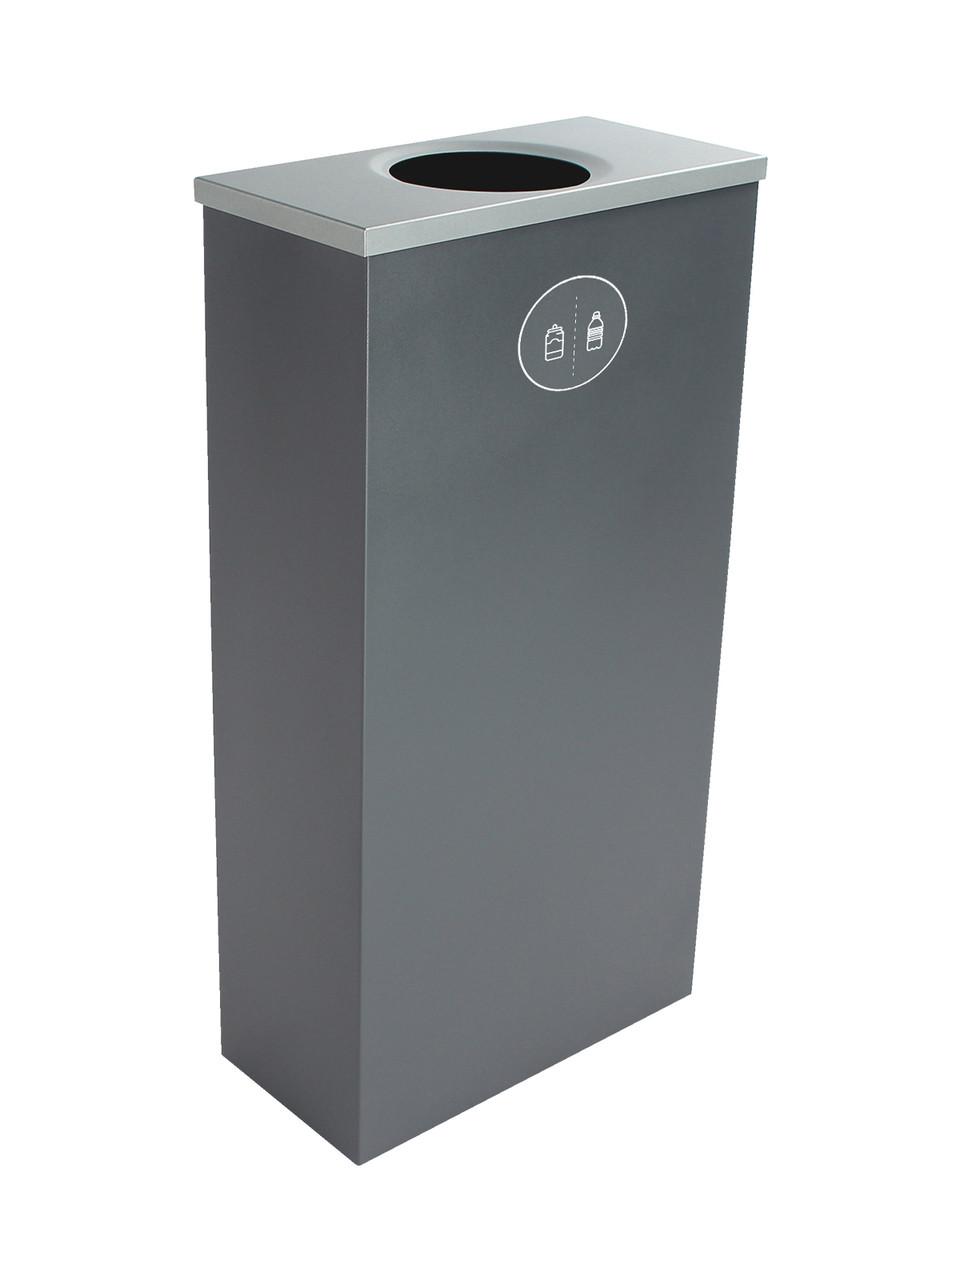 10 Gallon Steel Spectrum Slim Bottles & Cans Collector Gray 8107055-1